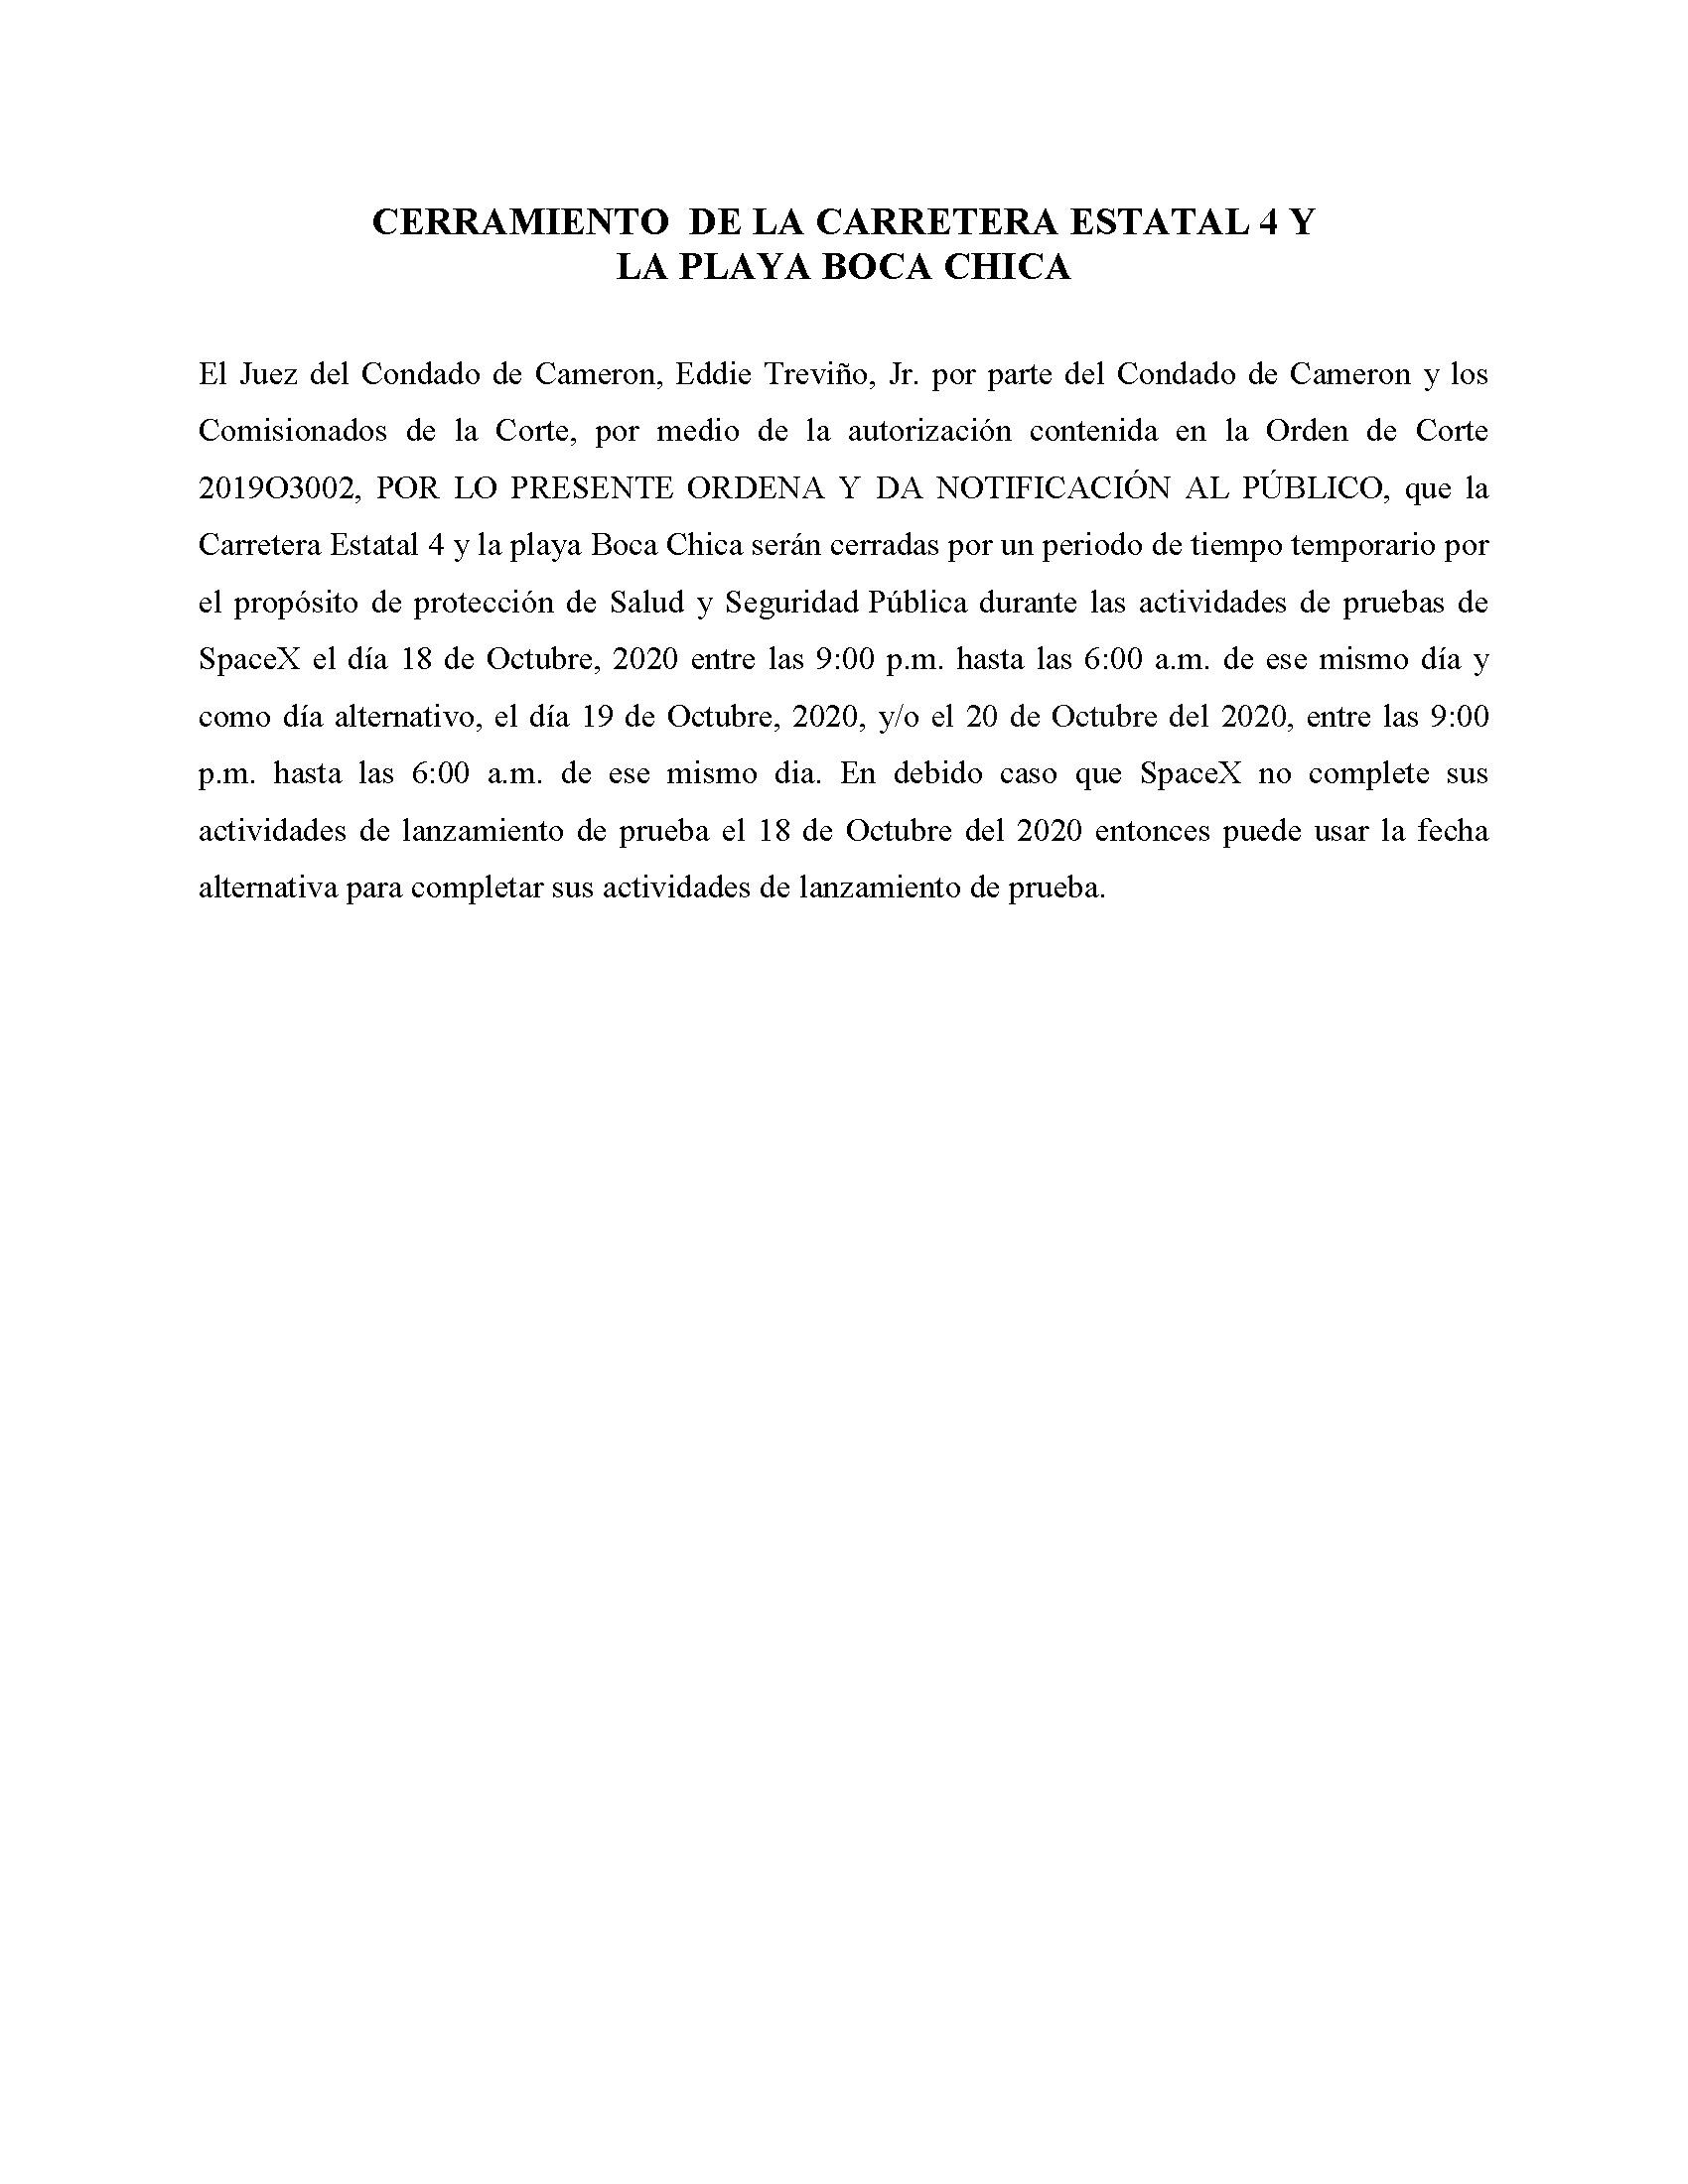 ORDER.CLOSURE OF HIGHWAY 4 Y LA PLAYA BOCA CHICA.SPANISH.10.18.20